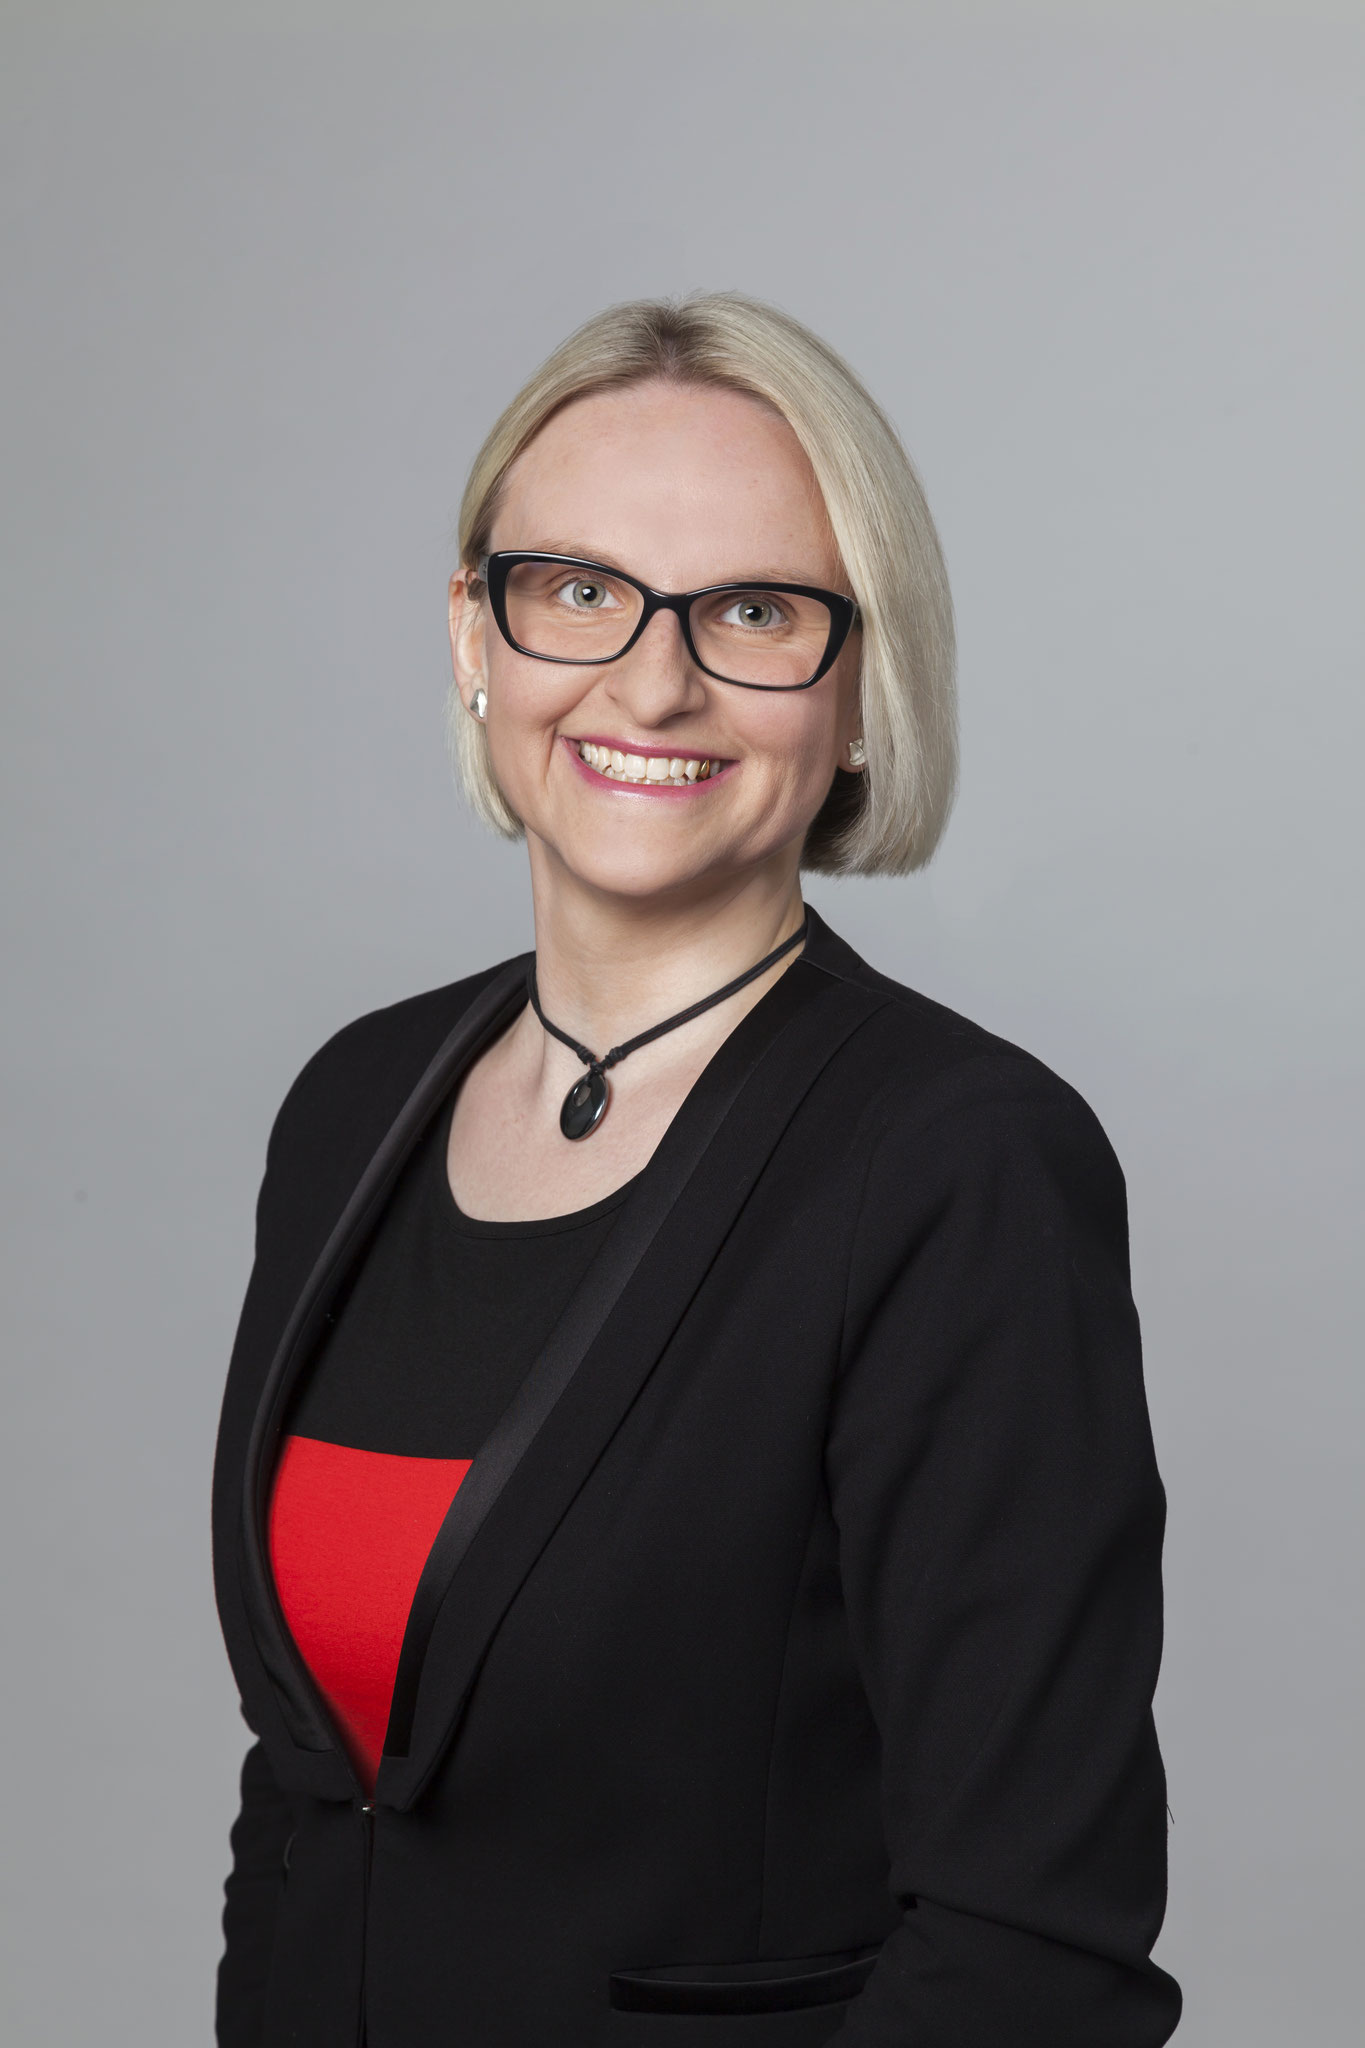 Christine-Sylvia Lade